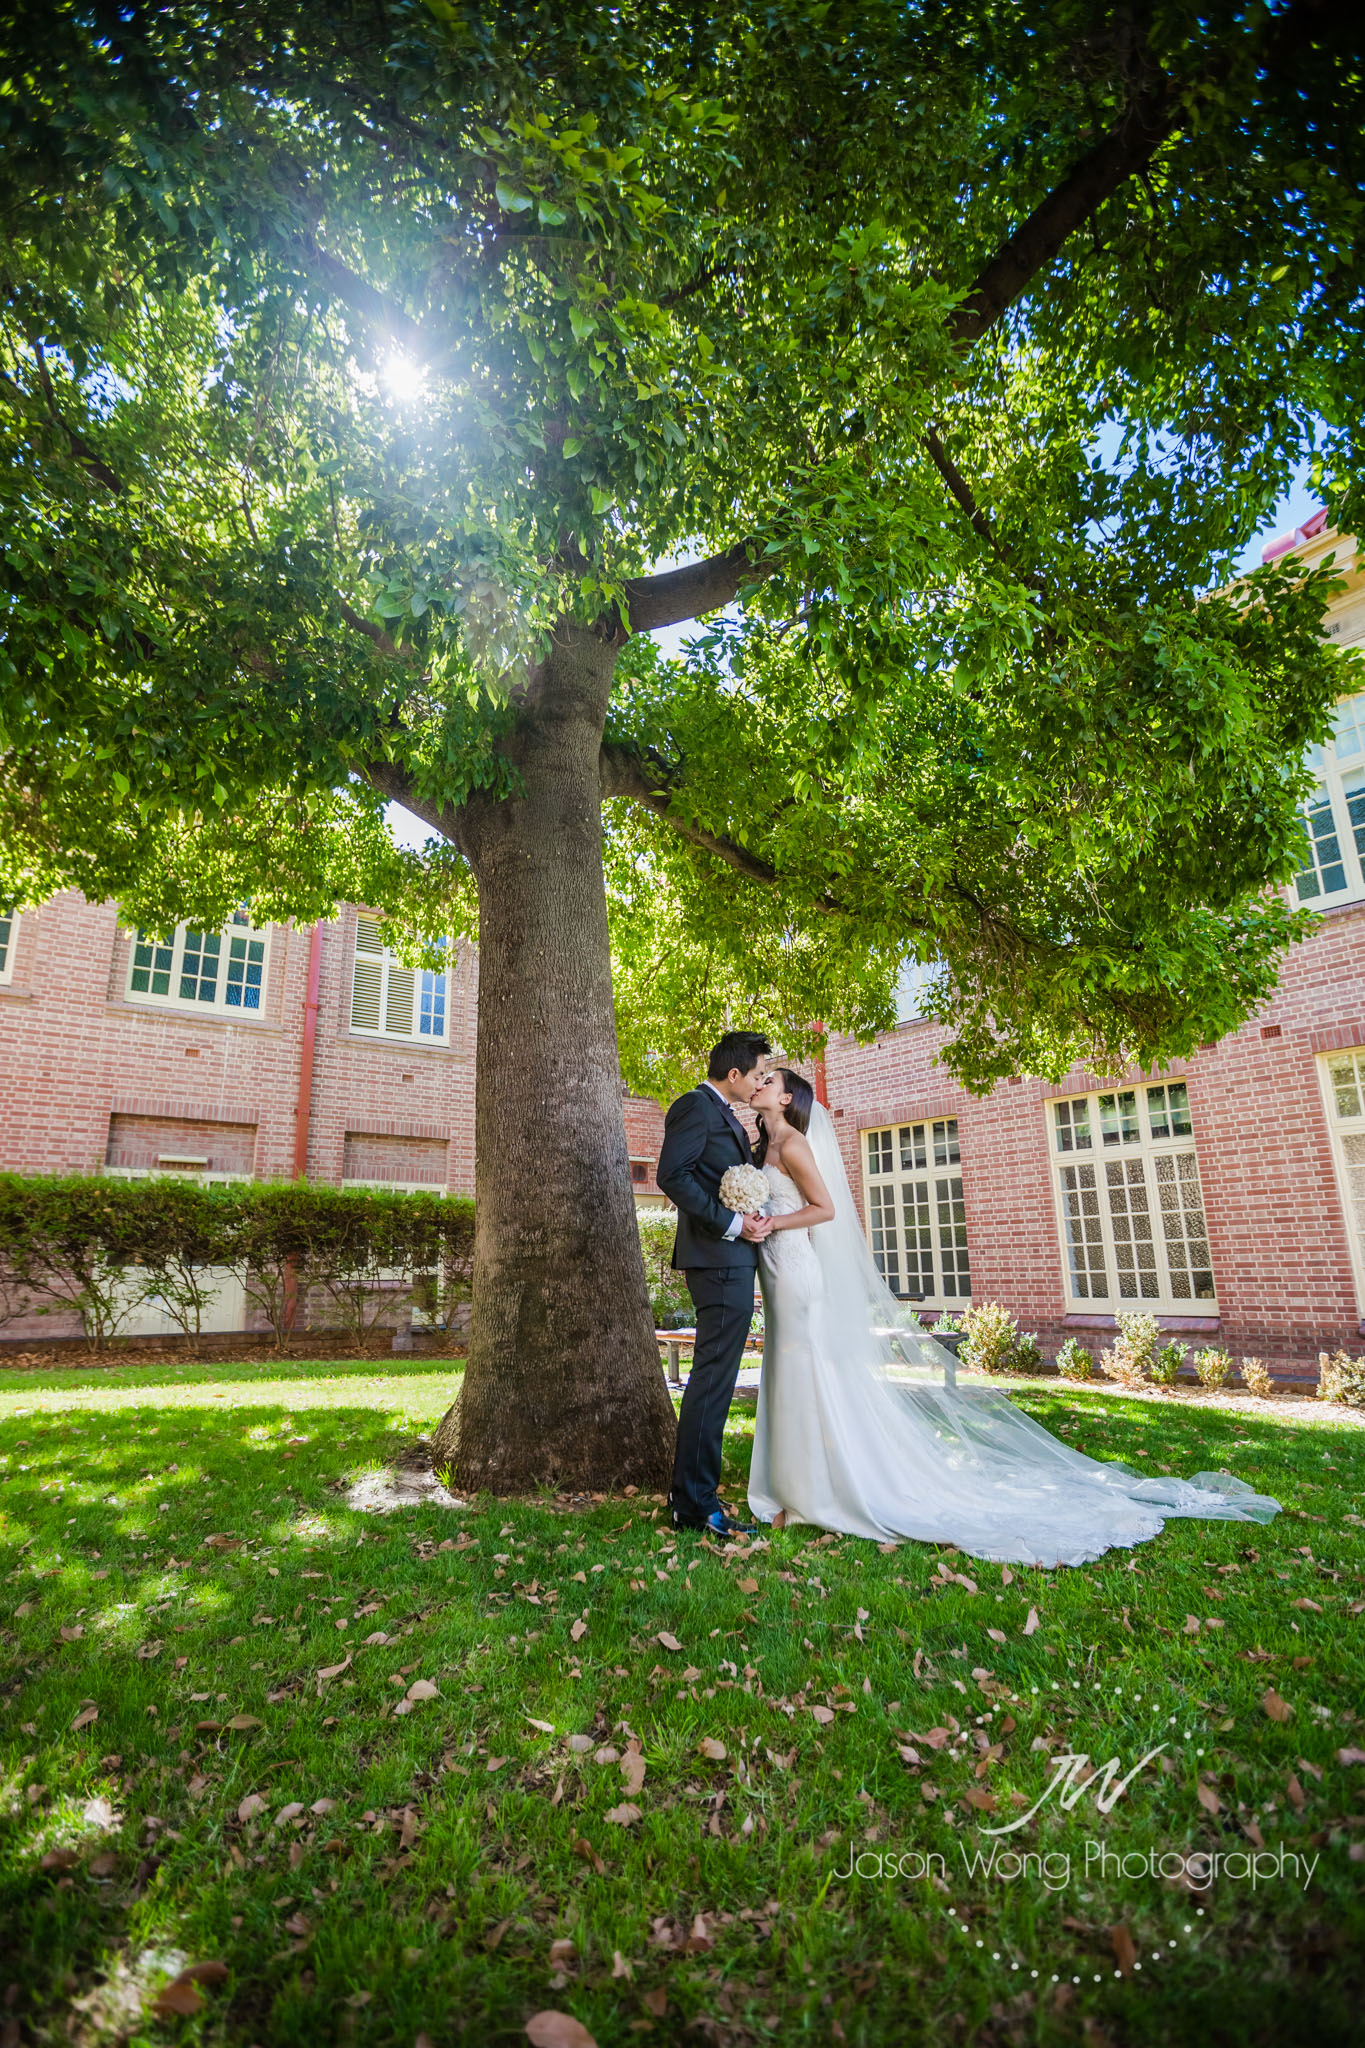 tree-so-green-and-newlyweds-so-sweet.jpg